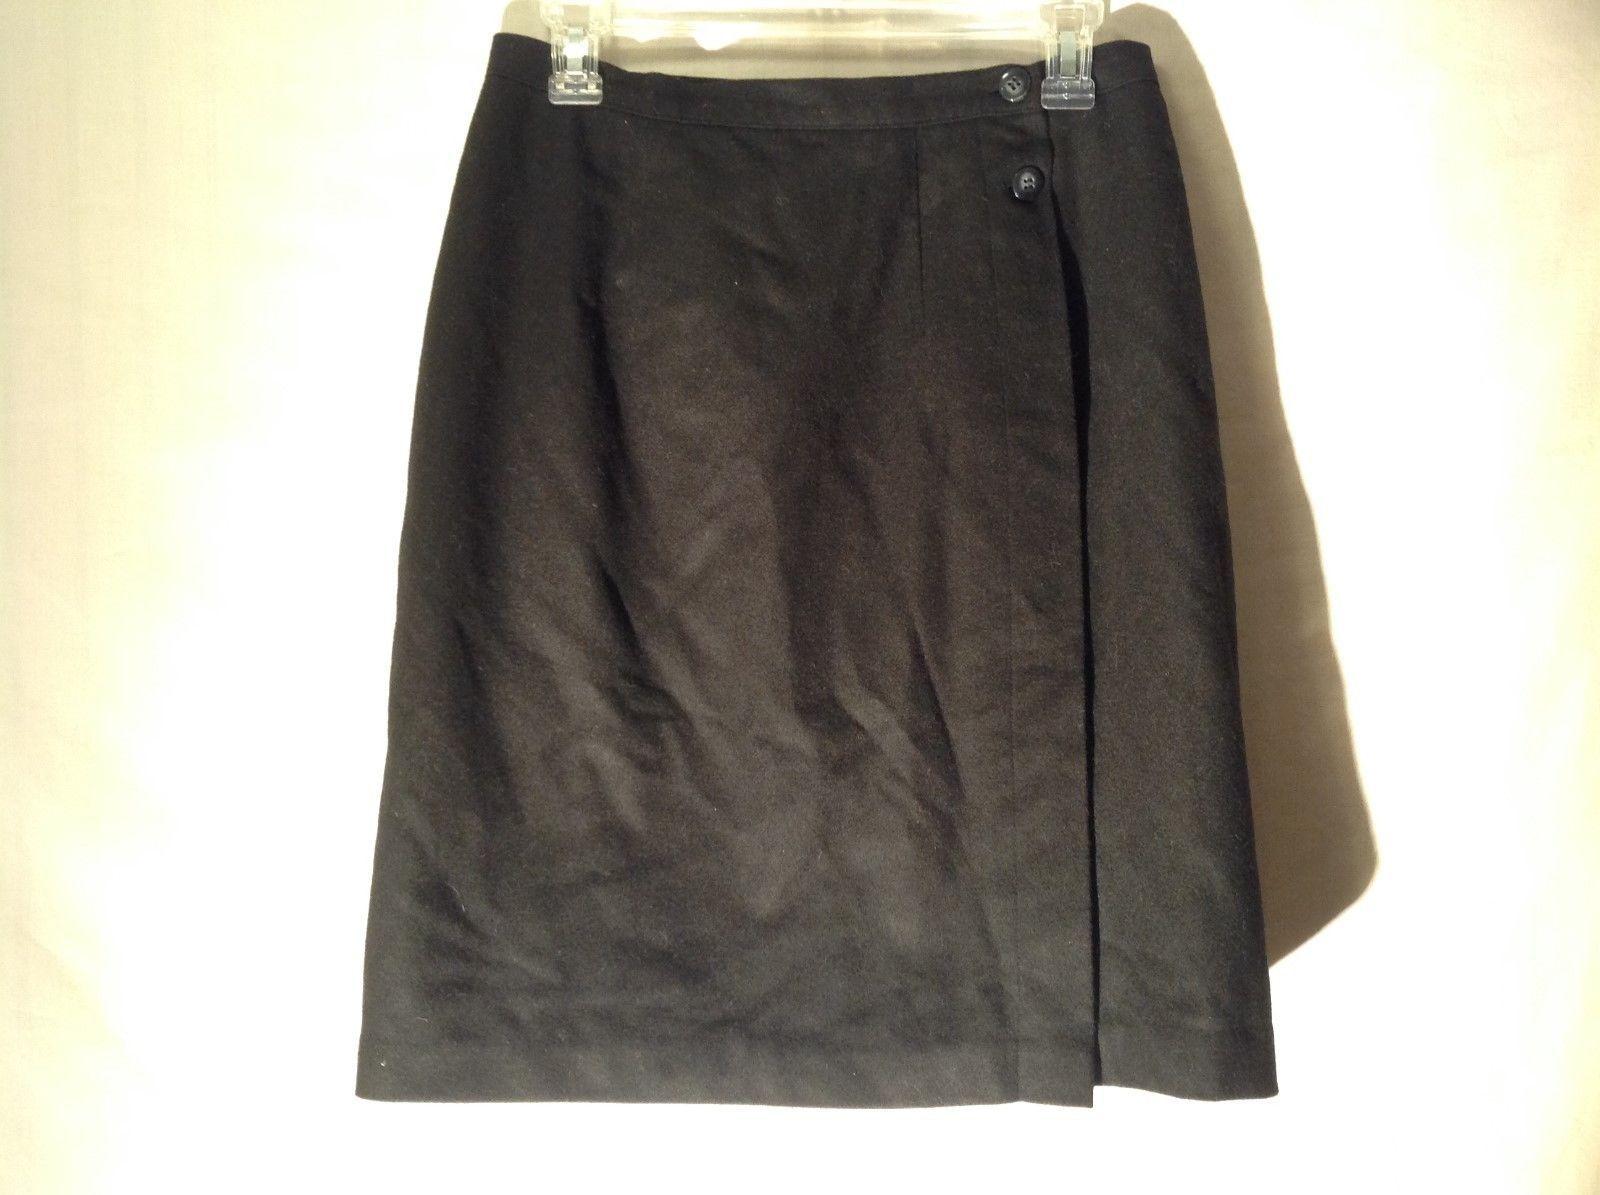 Womens Stephanie Andrews Black Wool Skirt Sz 6